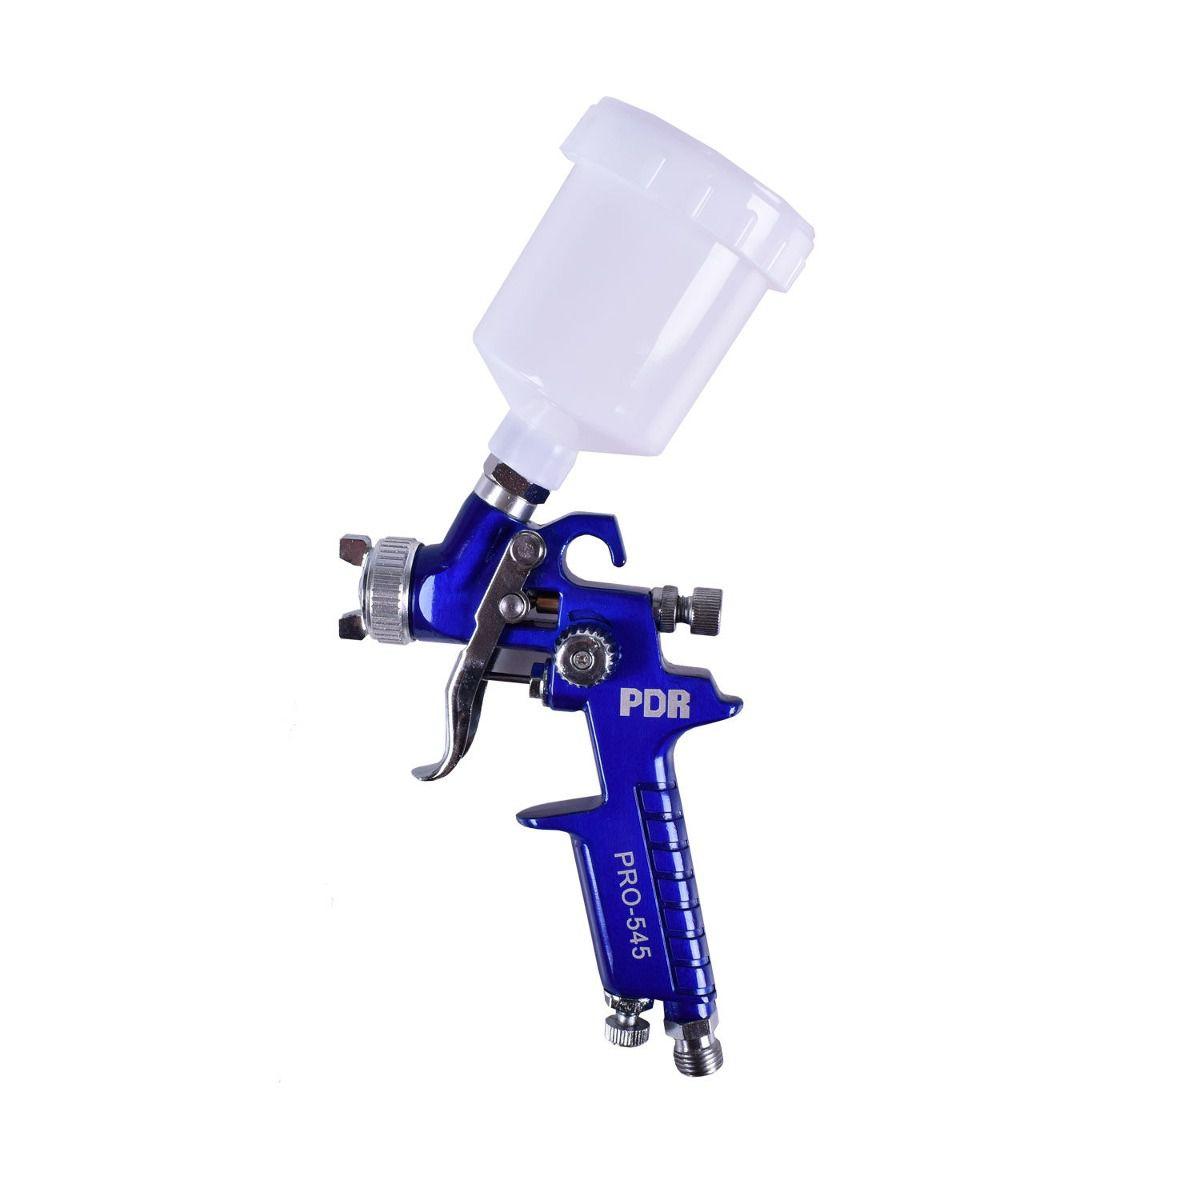 Pistola de Pintura HVLP Bico 0.8 125 ML LDR PRO-545